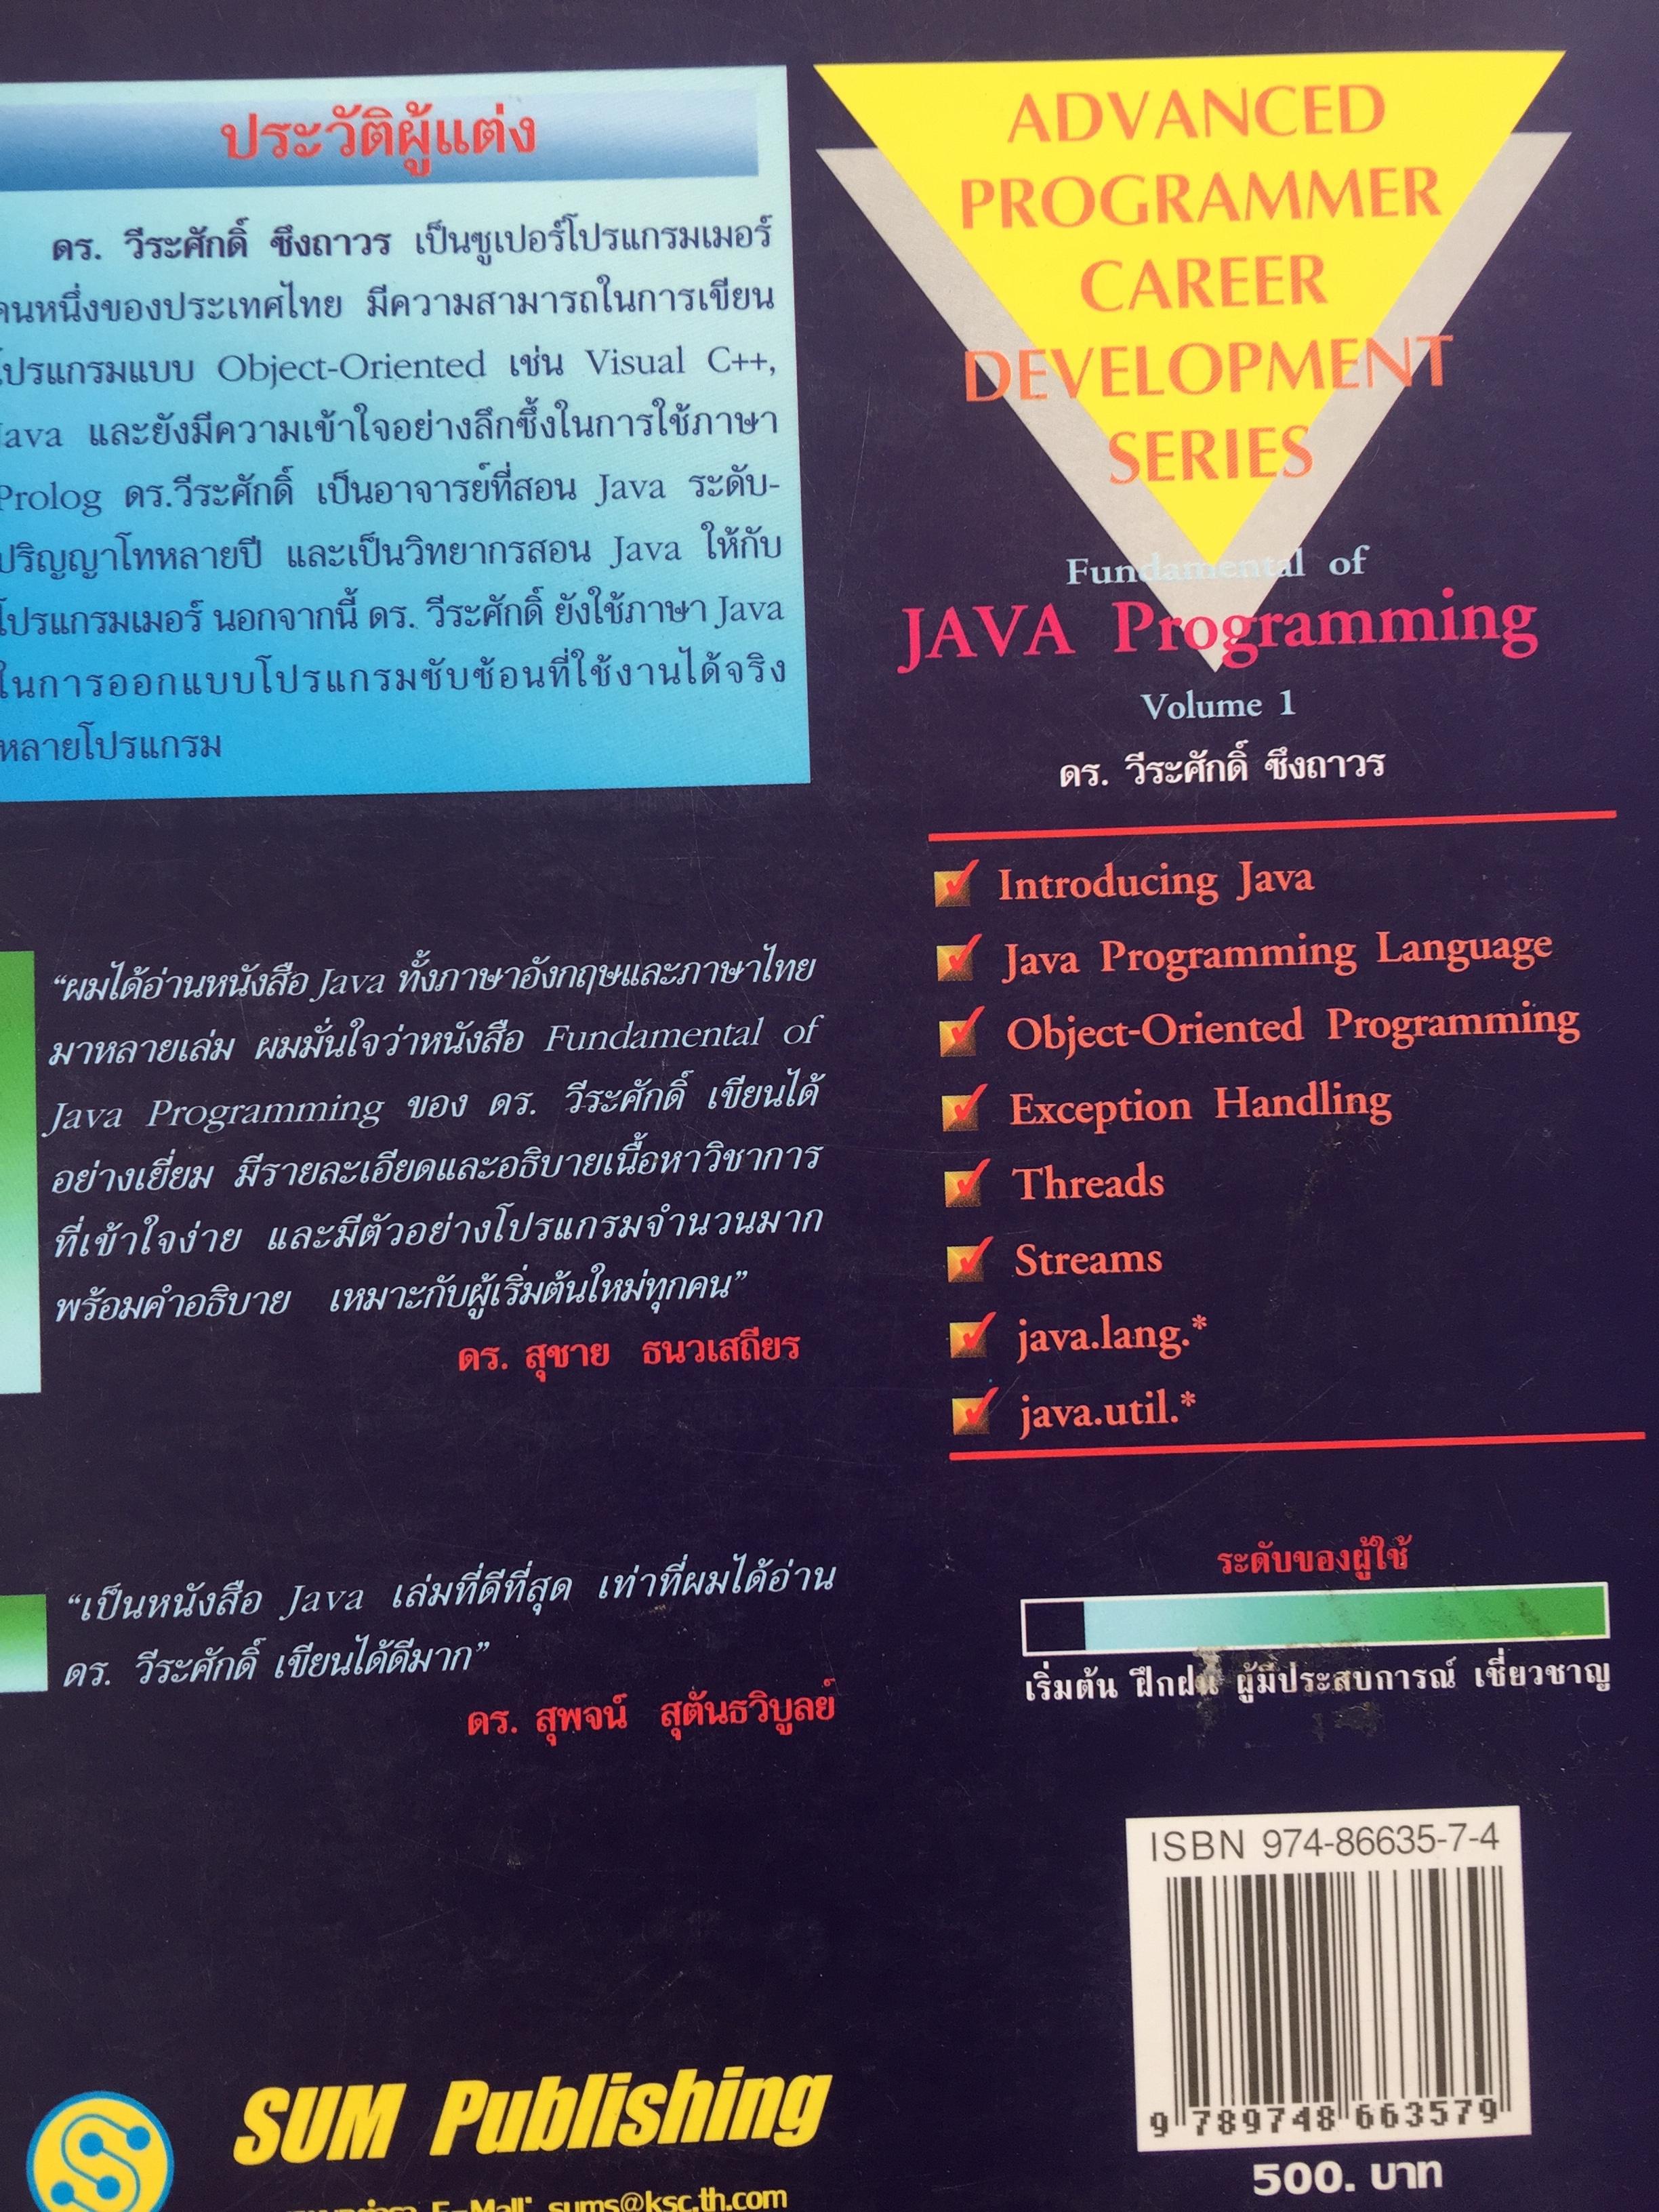 Fundamental of JAVA Programming Volume 1. ผู้เขียน. ดร วีระศักดิ์ ซึงถาวร